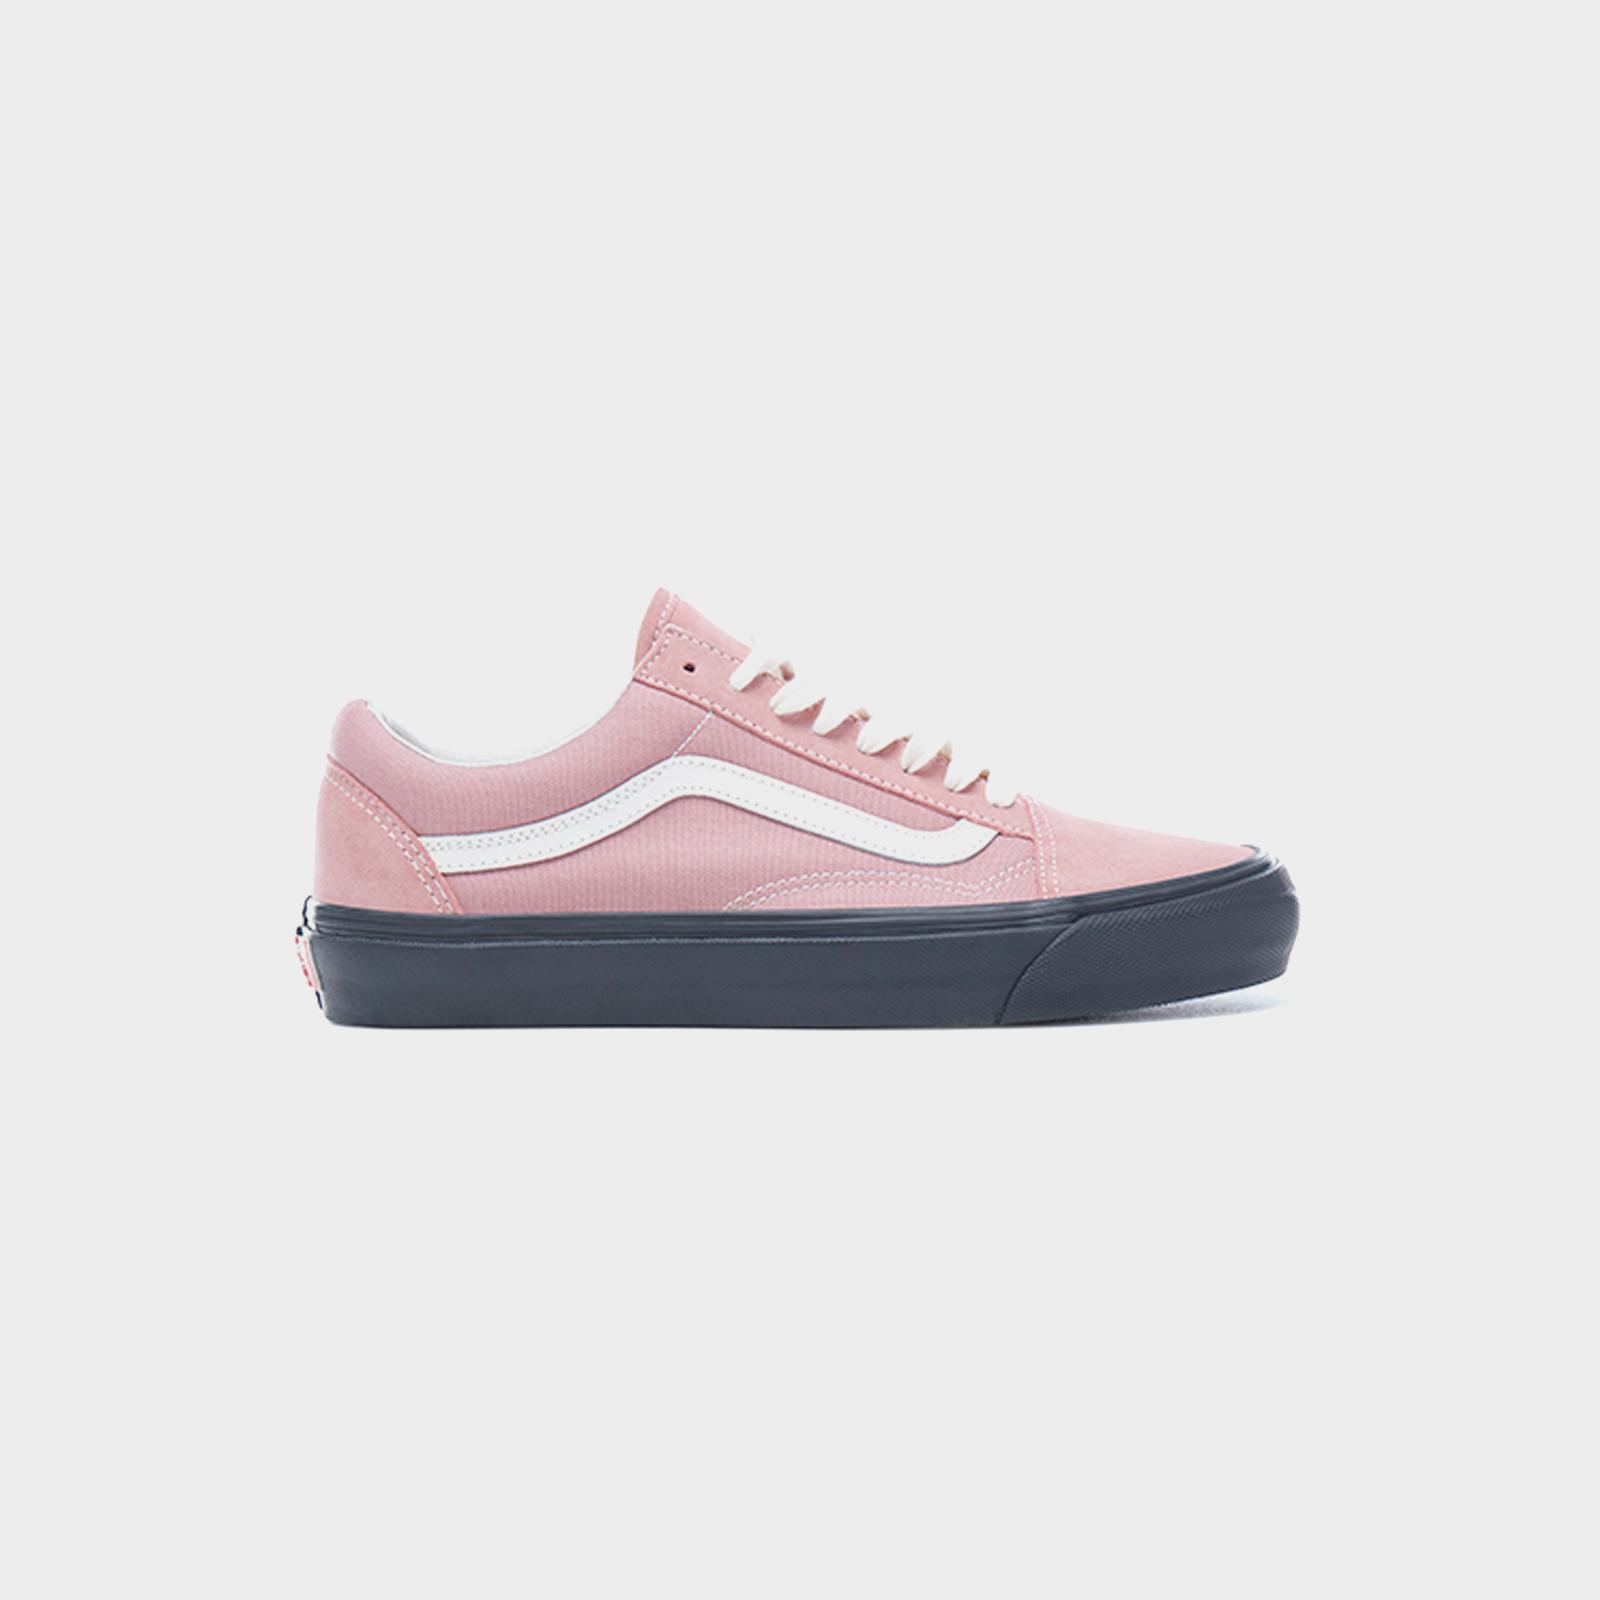 Vans Ua OG Old Skool LX - Va36c8qm2 - Sneakersnstuff  c0719f4a2